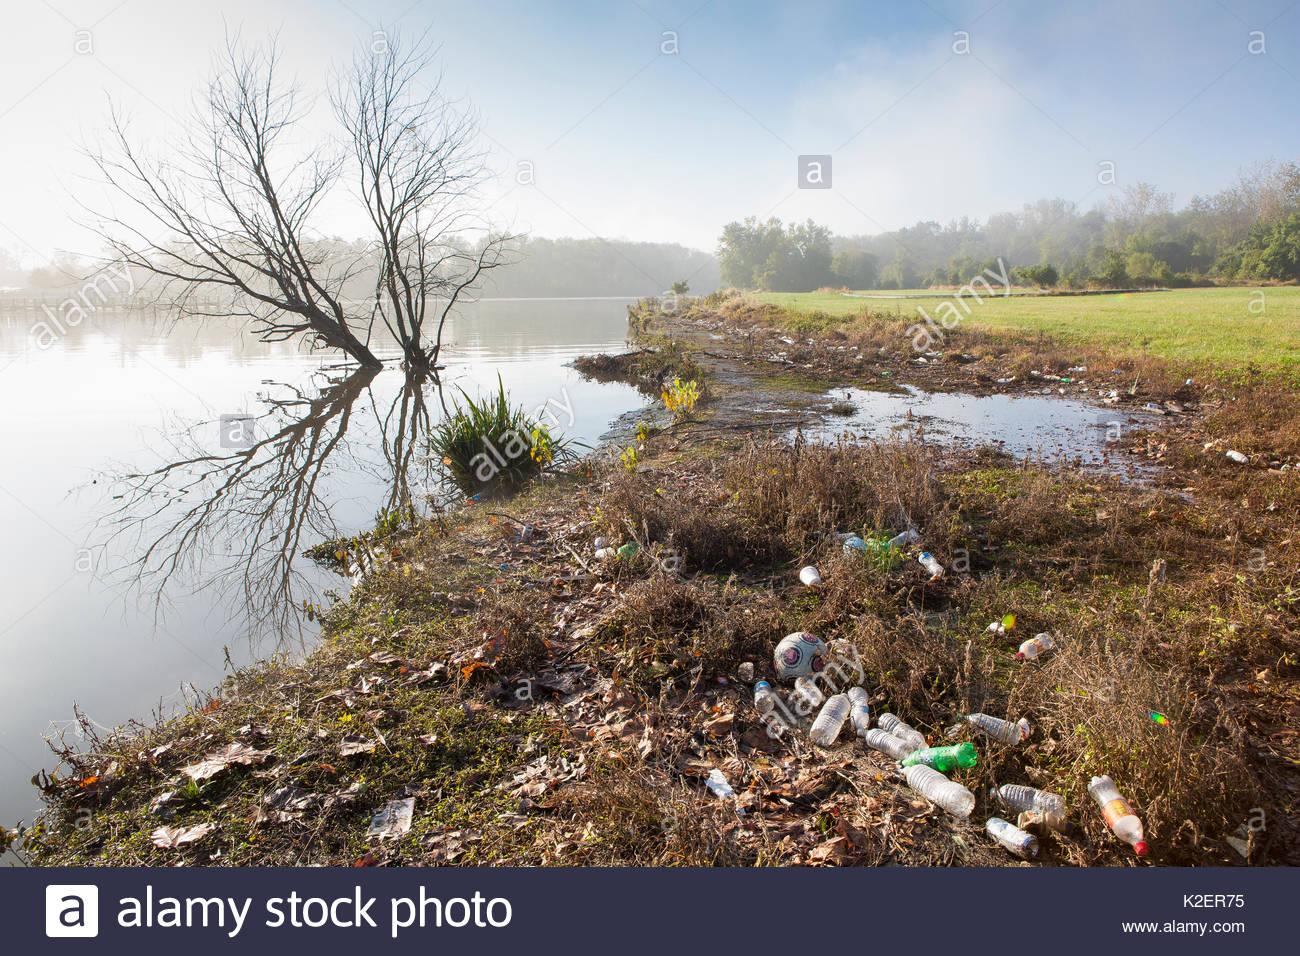 Rubbish on the shore of the Anacostia River, Washington DC. USA, October 2013. - Stock Image